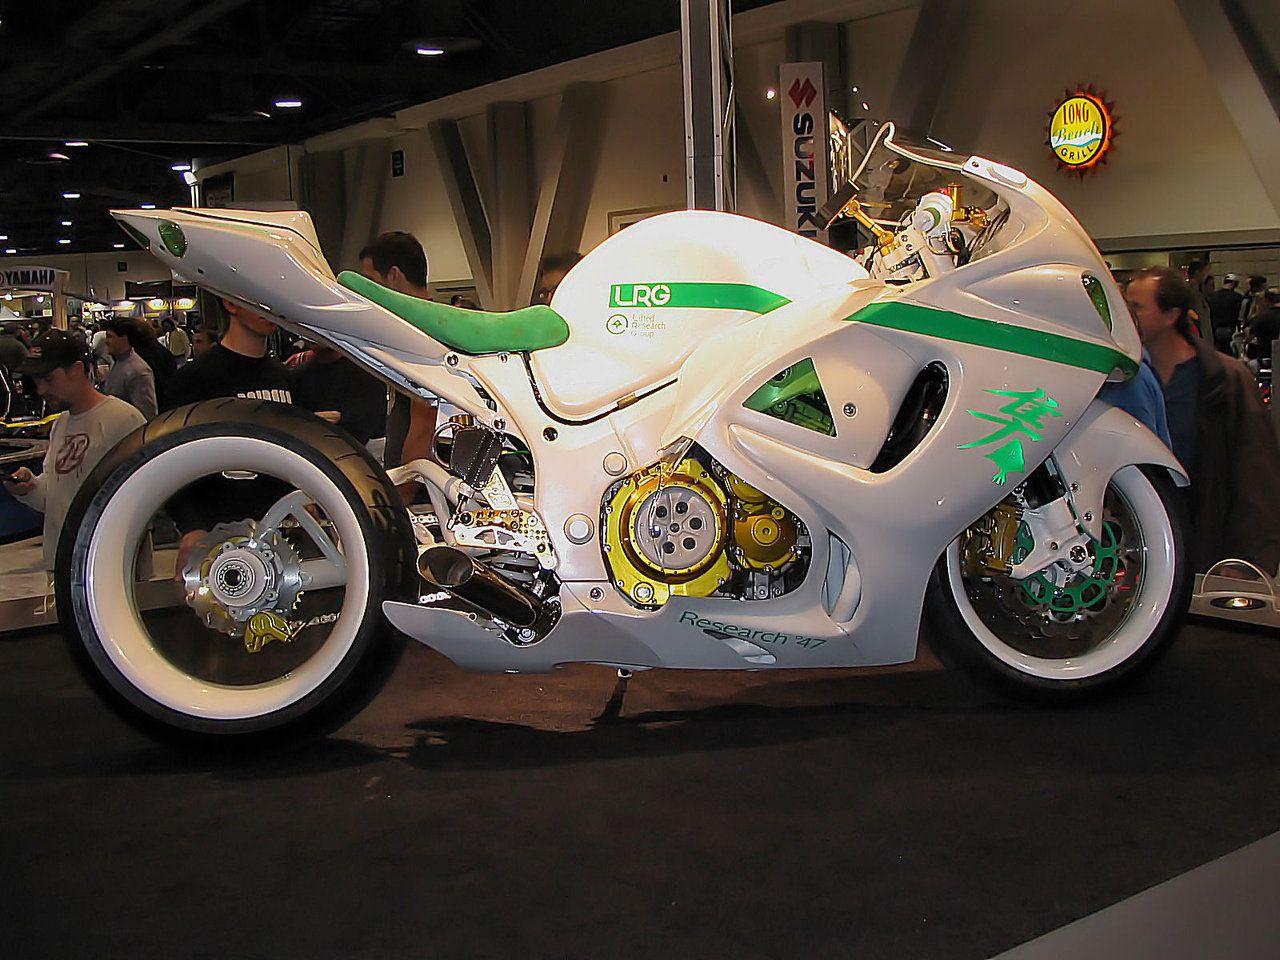 Custom Sport Bike 16 By Drivenbychaos Deviantart Com On